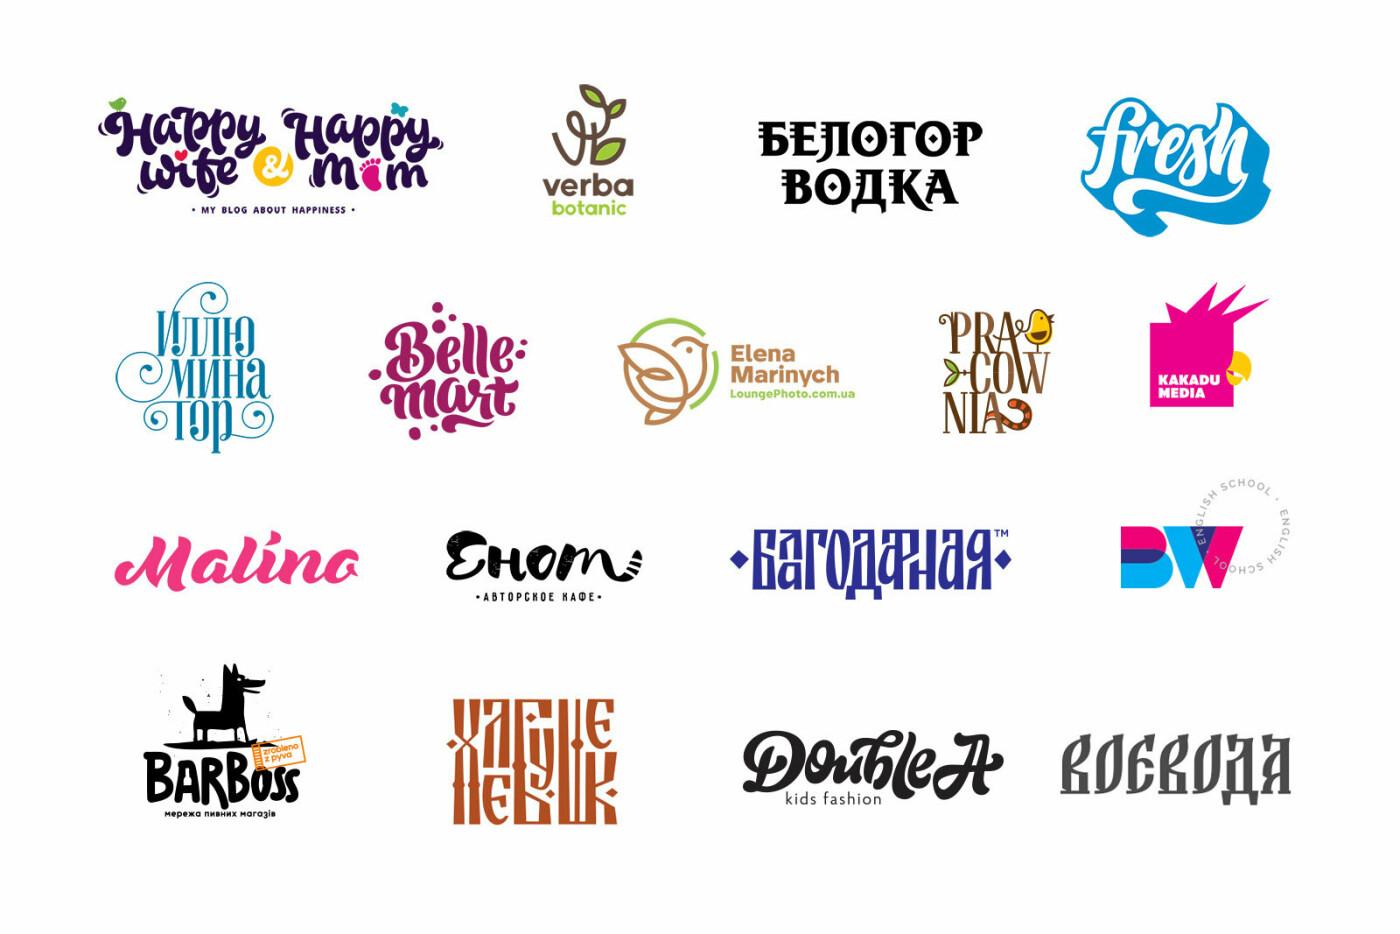 Наталья Белоусова: «Дизайн — это работа без границ», фото-14, Наталья Белоусова